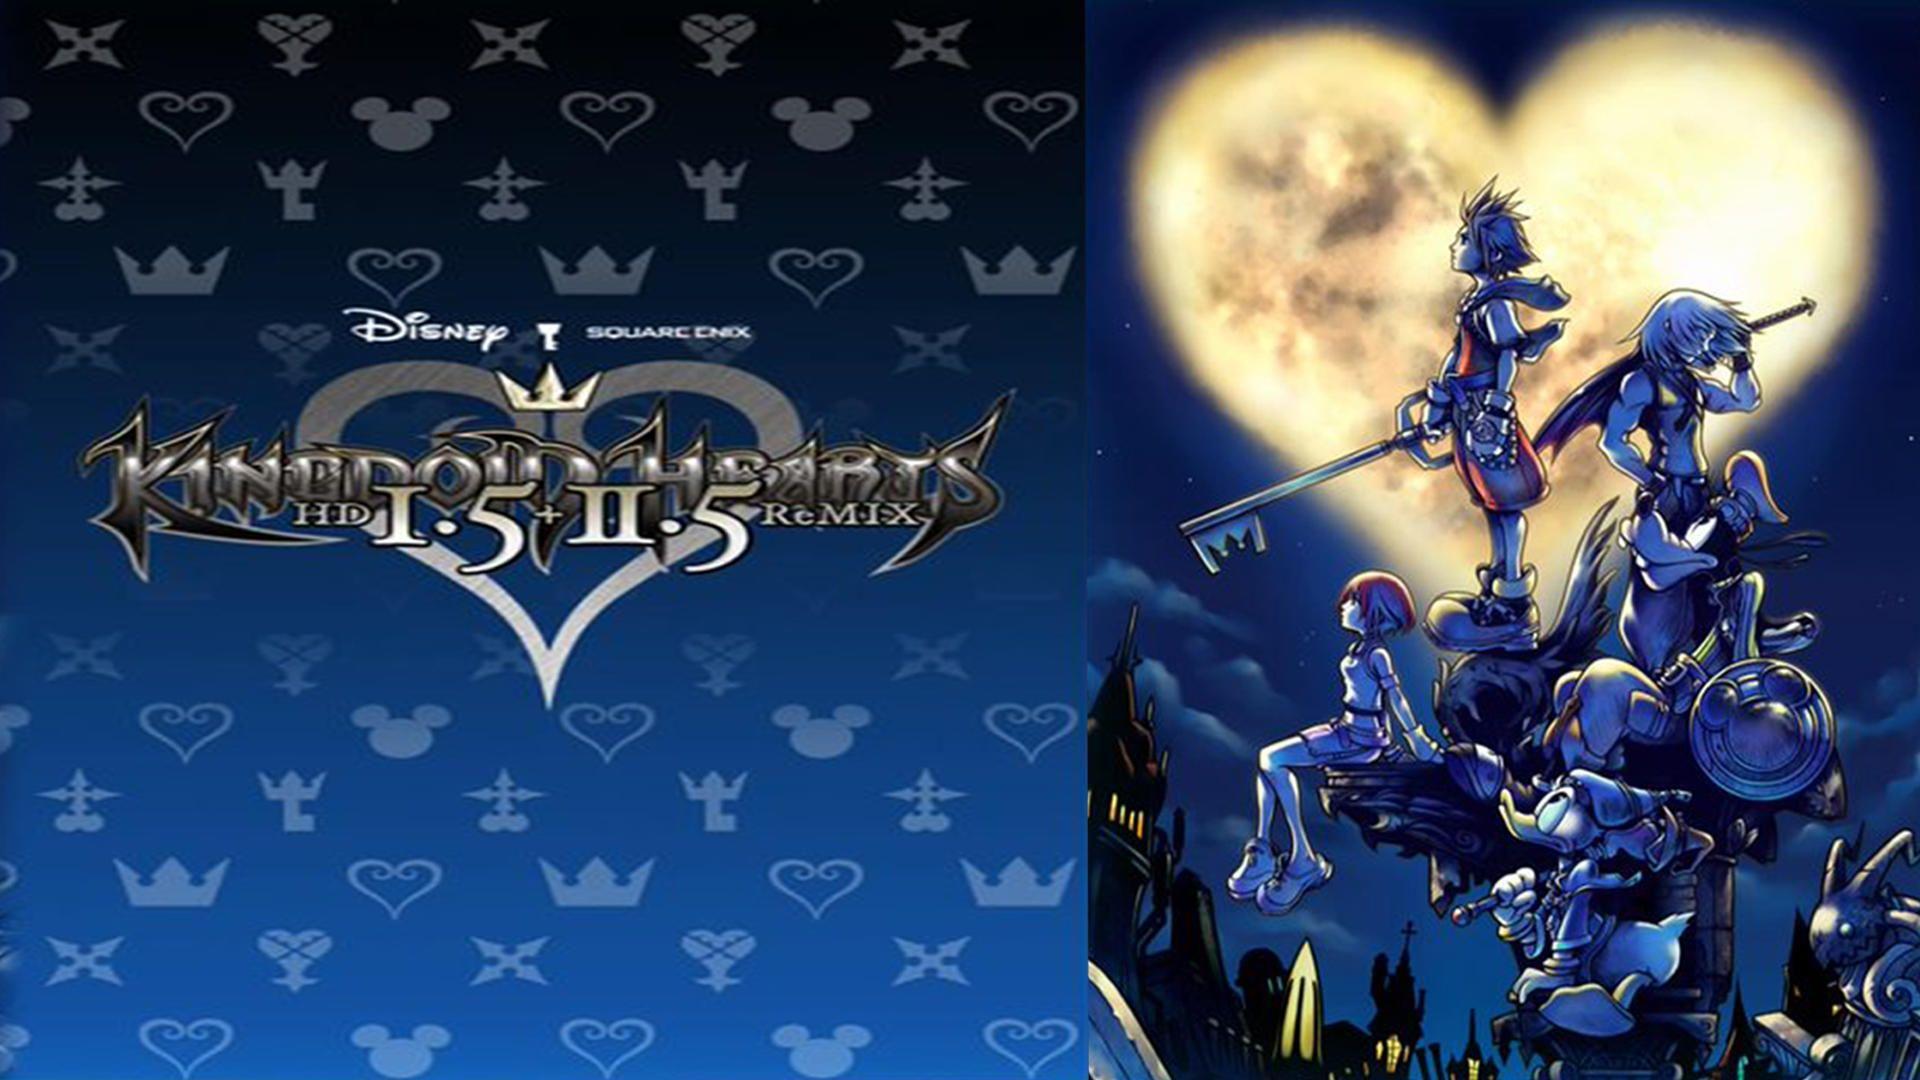 Kingdom Hearts Final Mix Wallpapers Top Free Kingdom Hearts